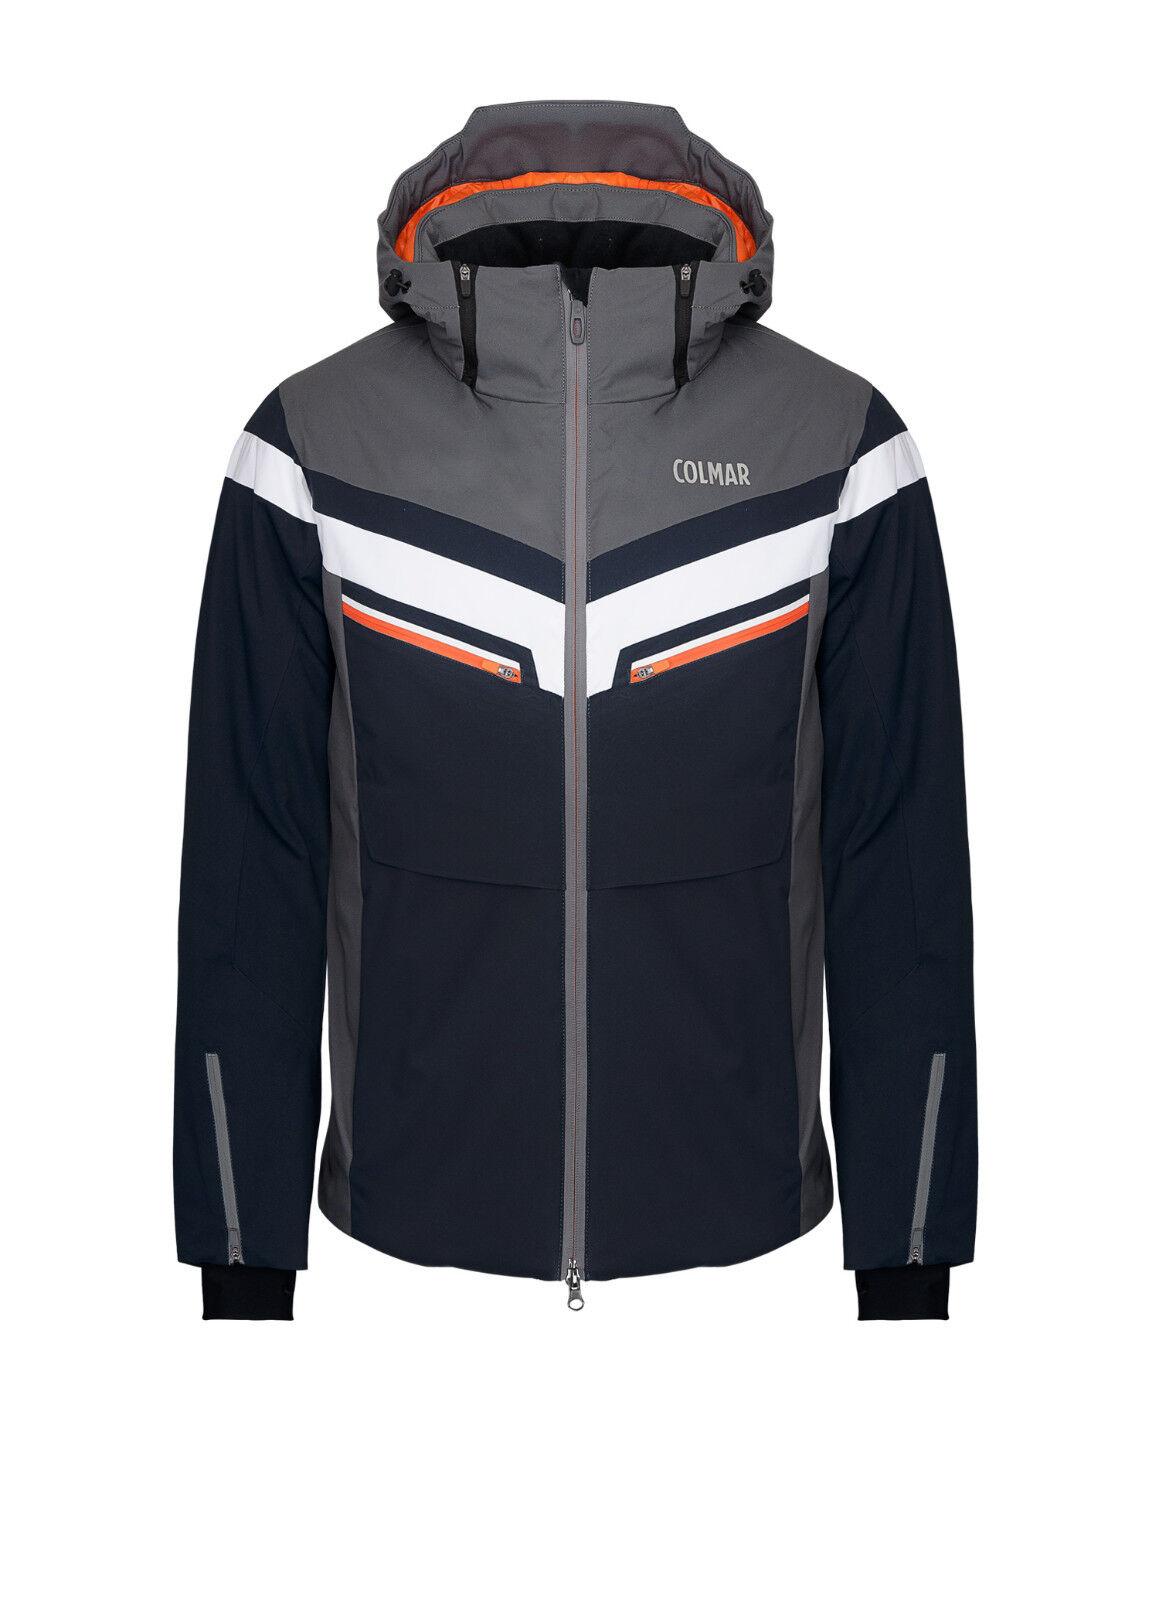 Giacca da sci uomo linea Alpine COLMAR mod. 1349 stagione 2017 2018